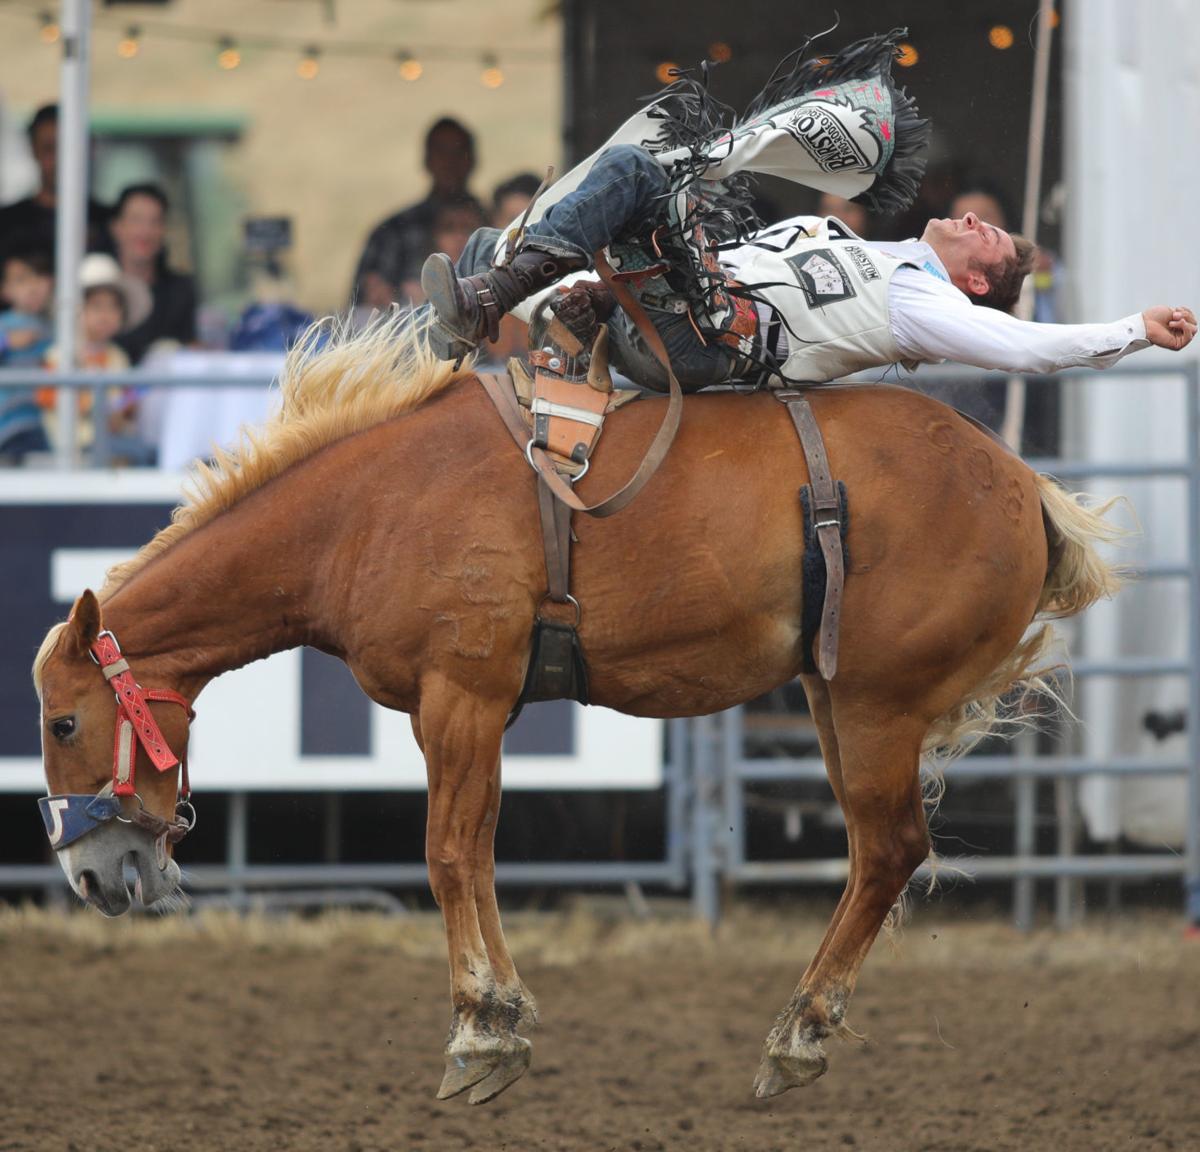 060219 Elks Rodeo Sunday 17.jpg